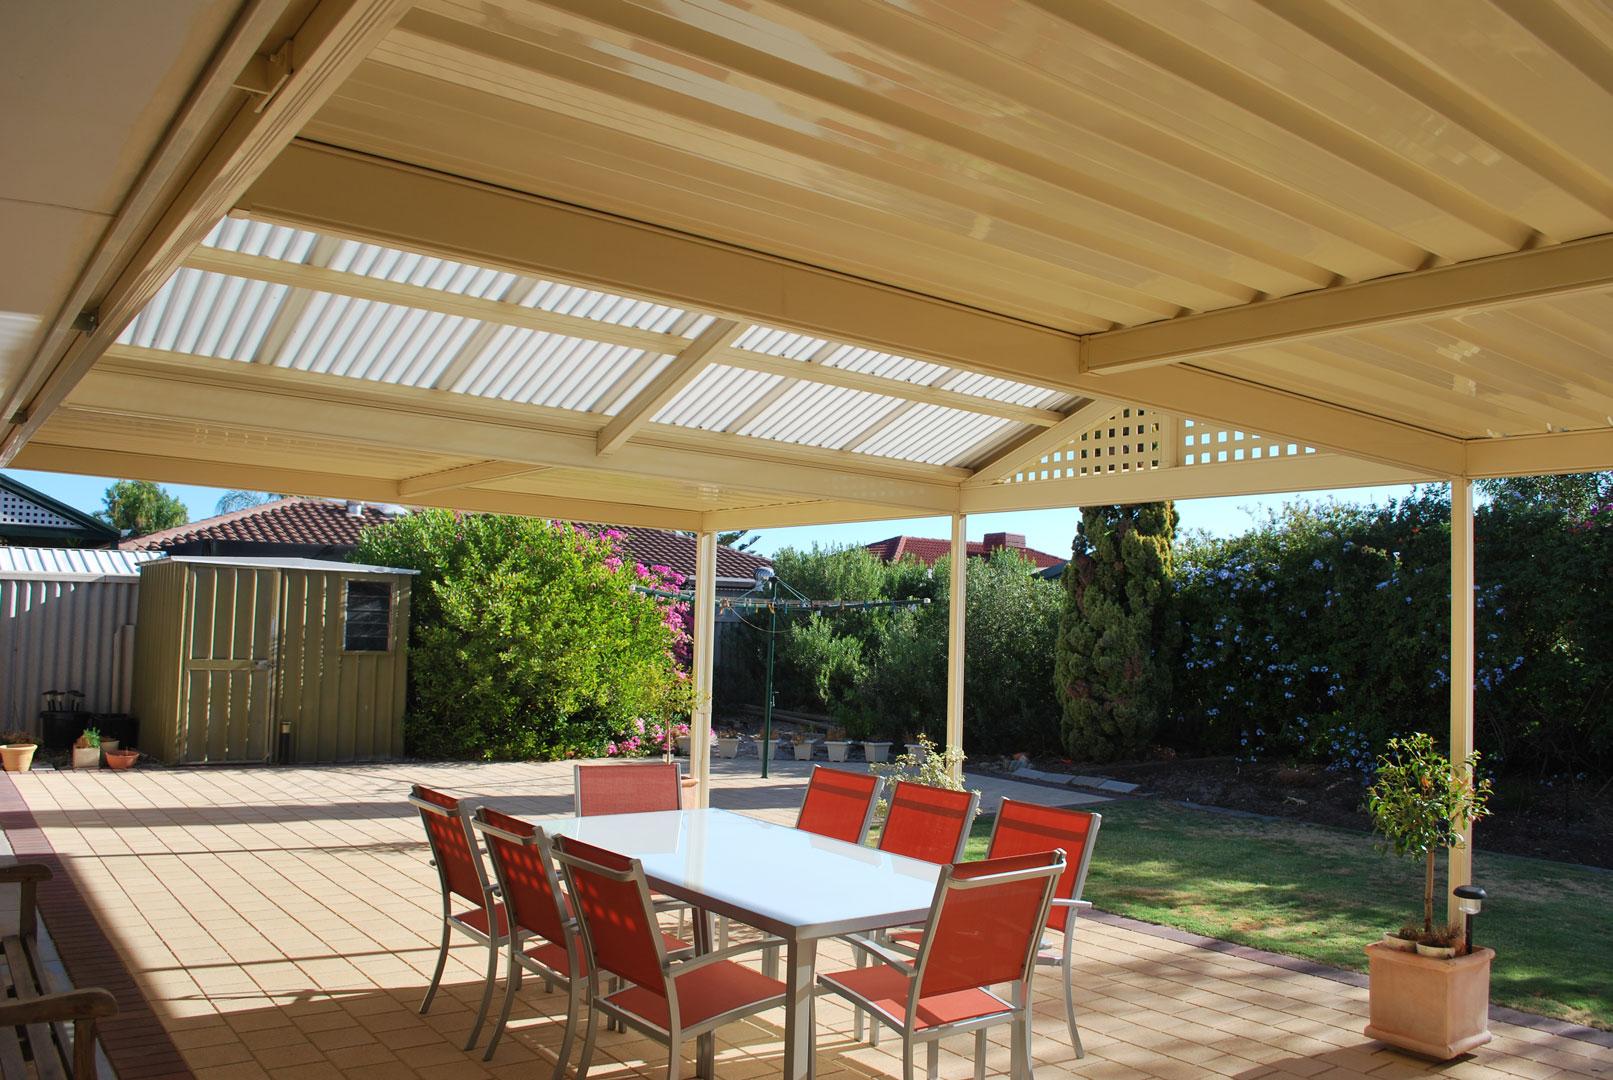 Unity home improvements verandahs - Veranda decoratie ...